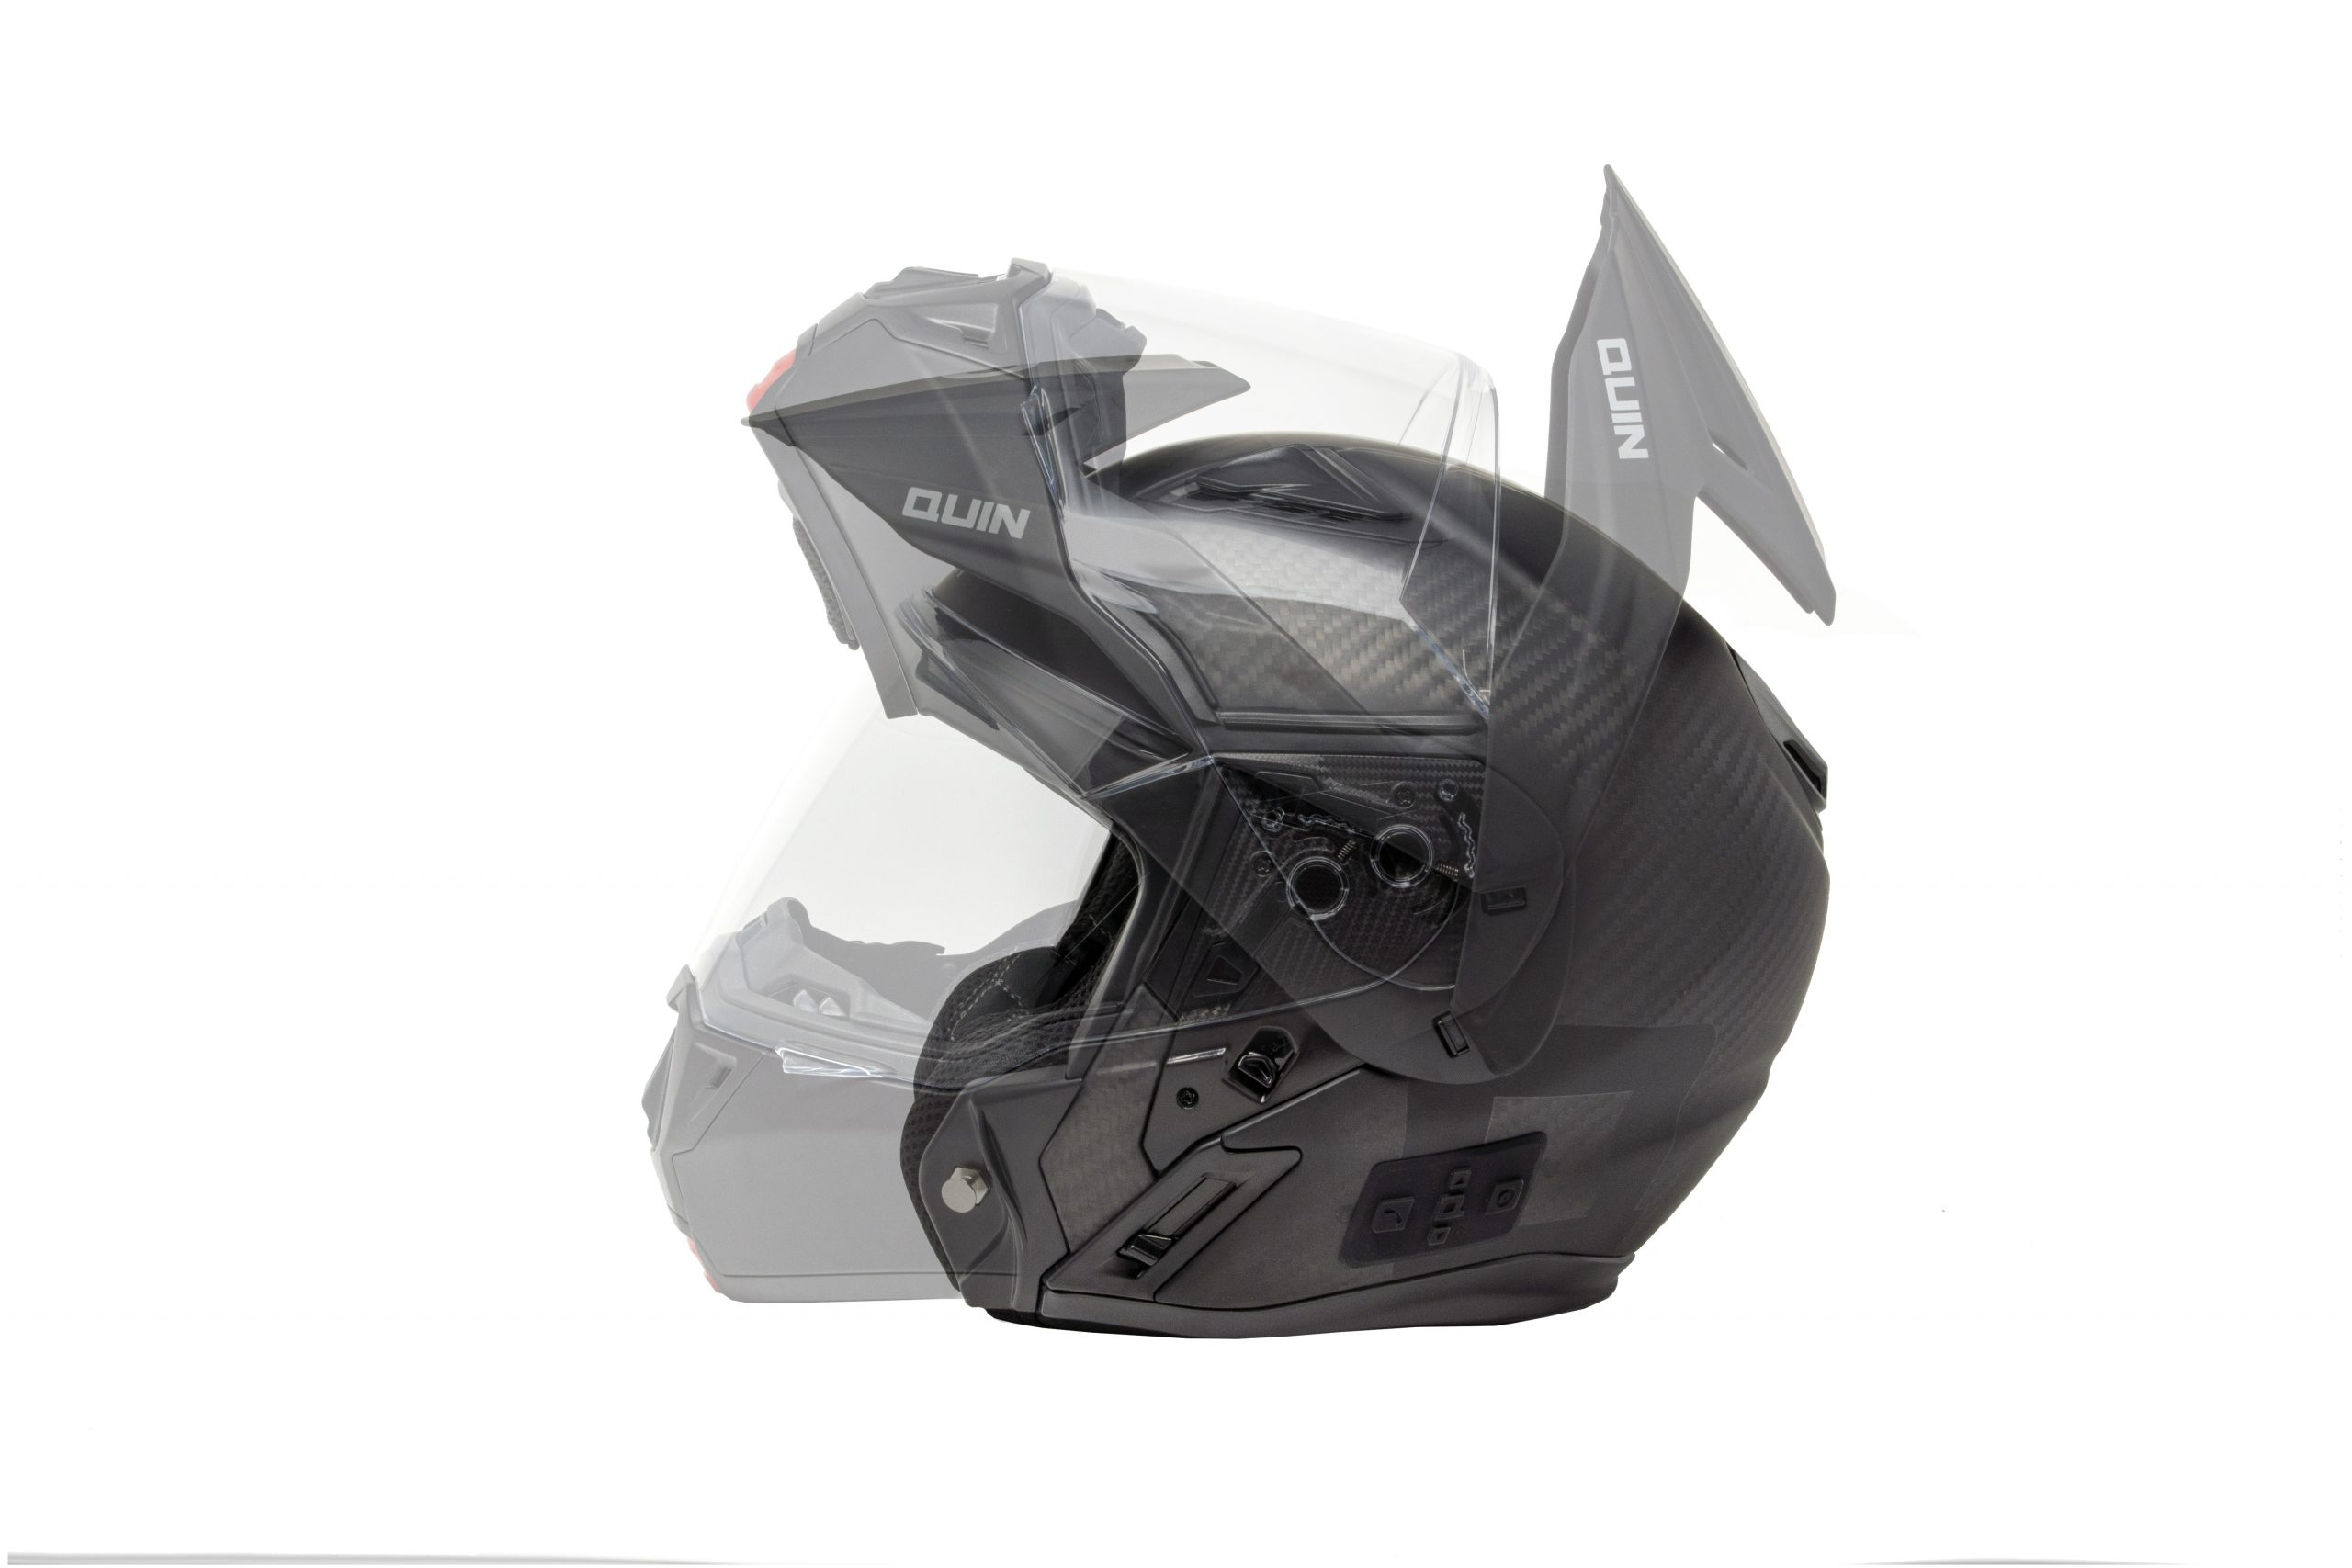 Quin Quest Modular Helmet